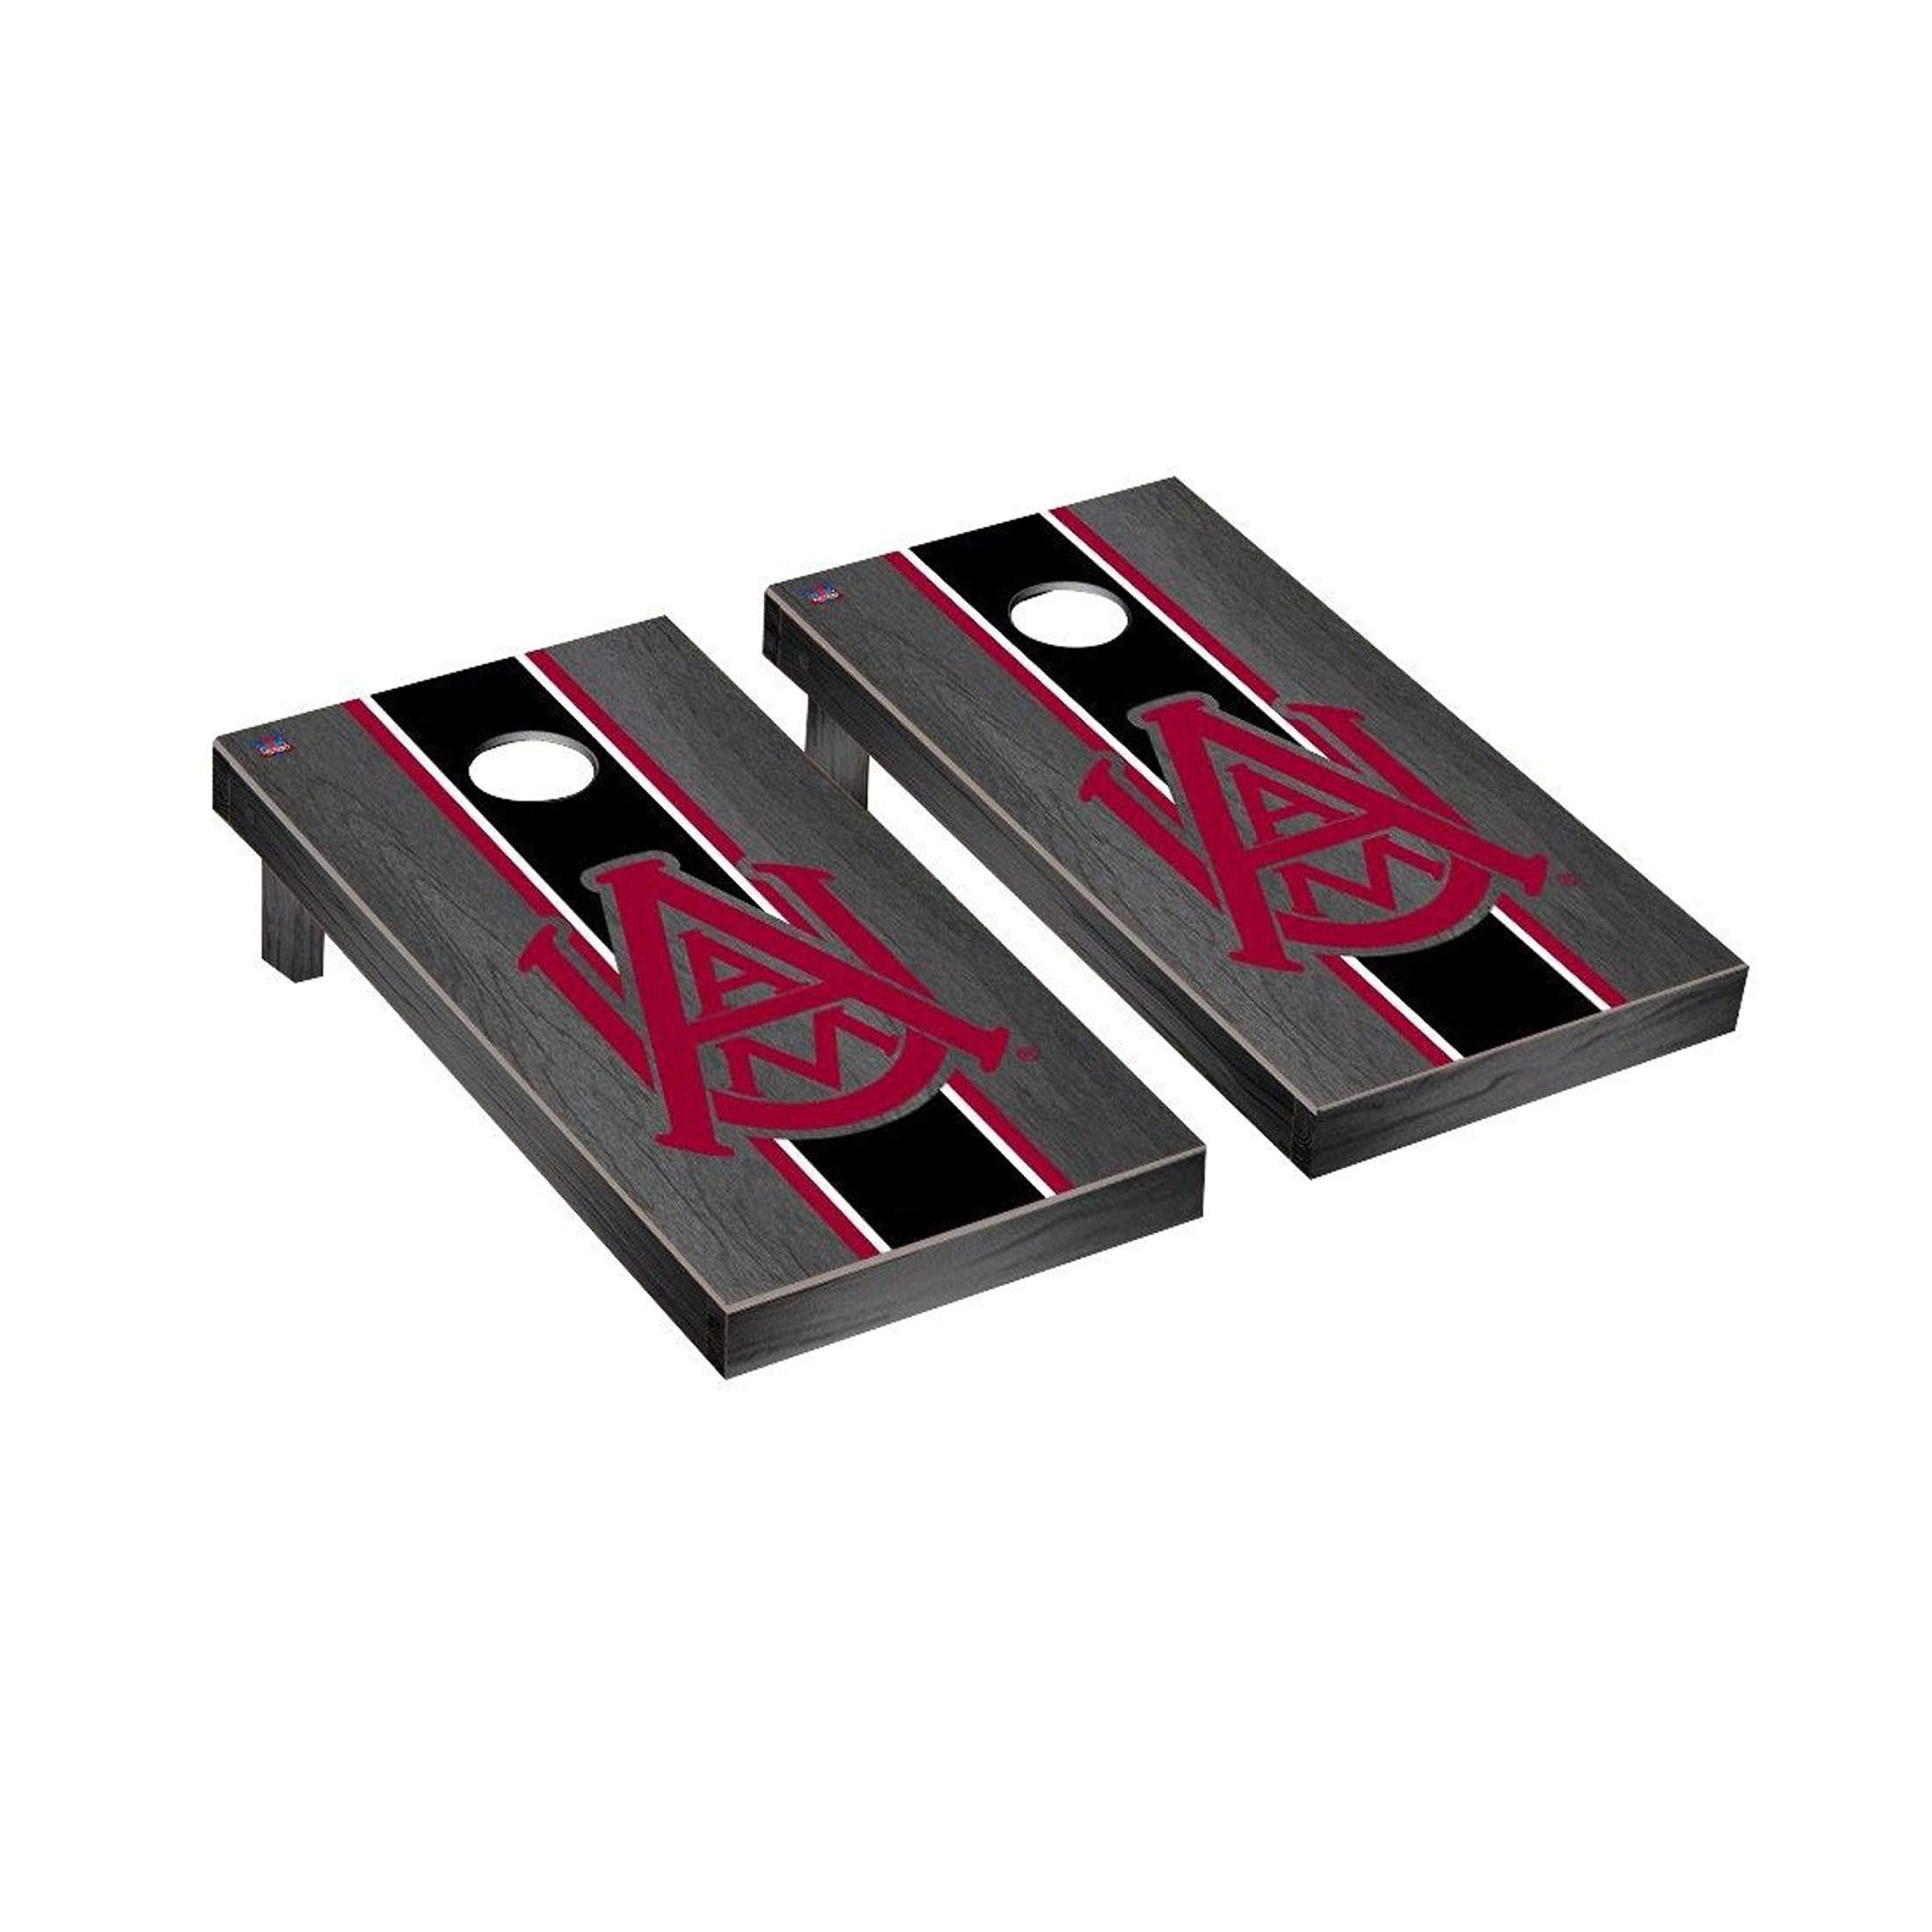 Victory Tailgate Regulation Collegiate NCAA Onyx Stained Stripe Series Cornhole Board Set - 2 Boards, 8 Bags - Alabama A&M Bulldogs